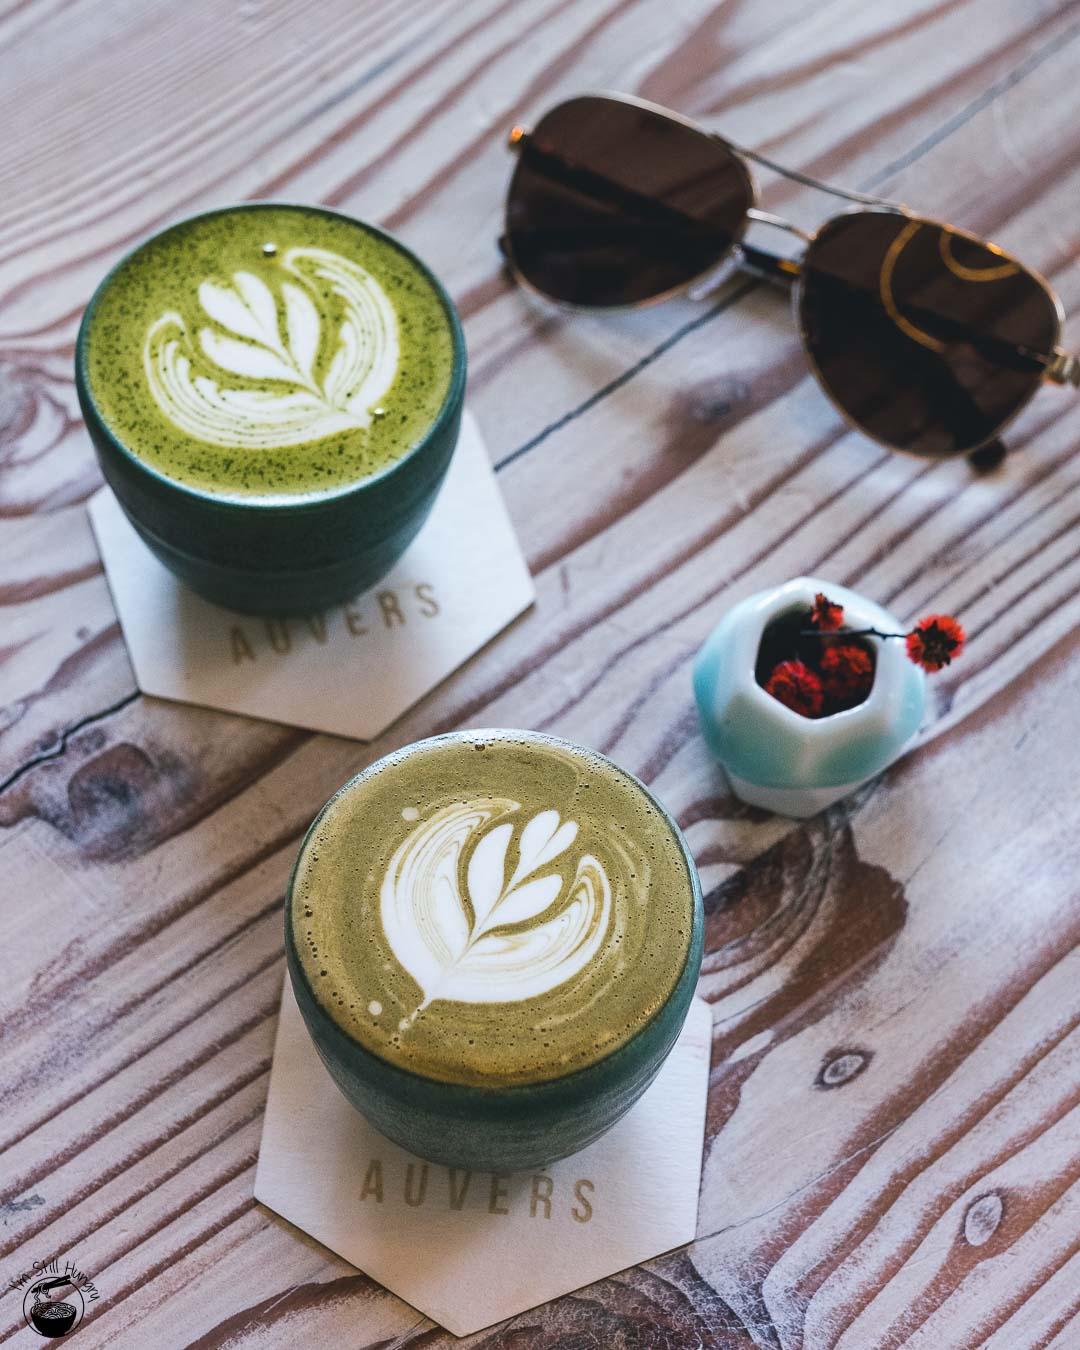 Auvers Cafe Rhodes Matcha & Houjicha lattes